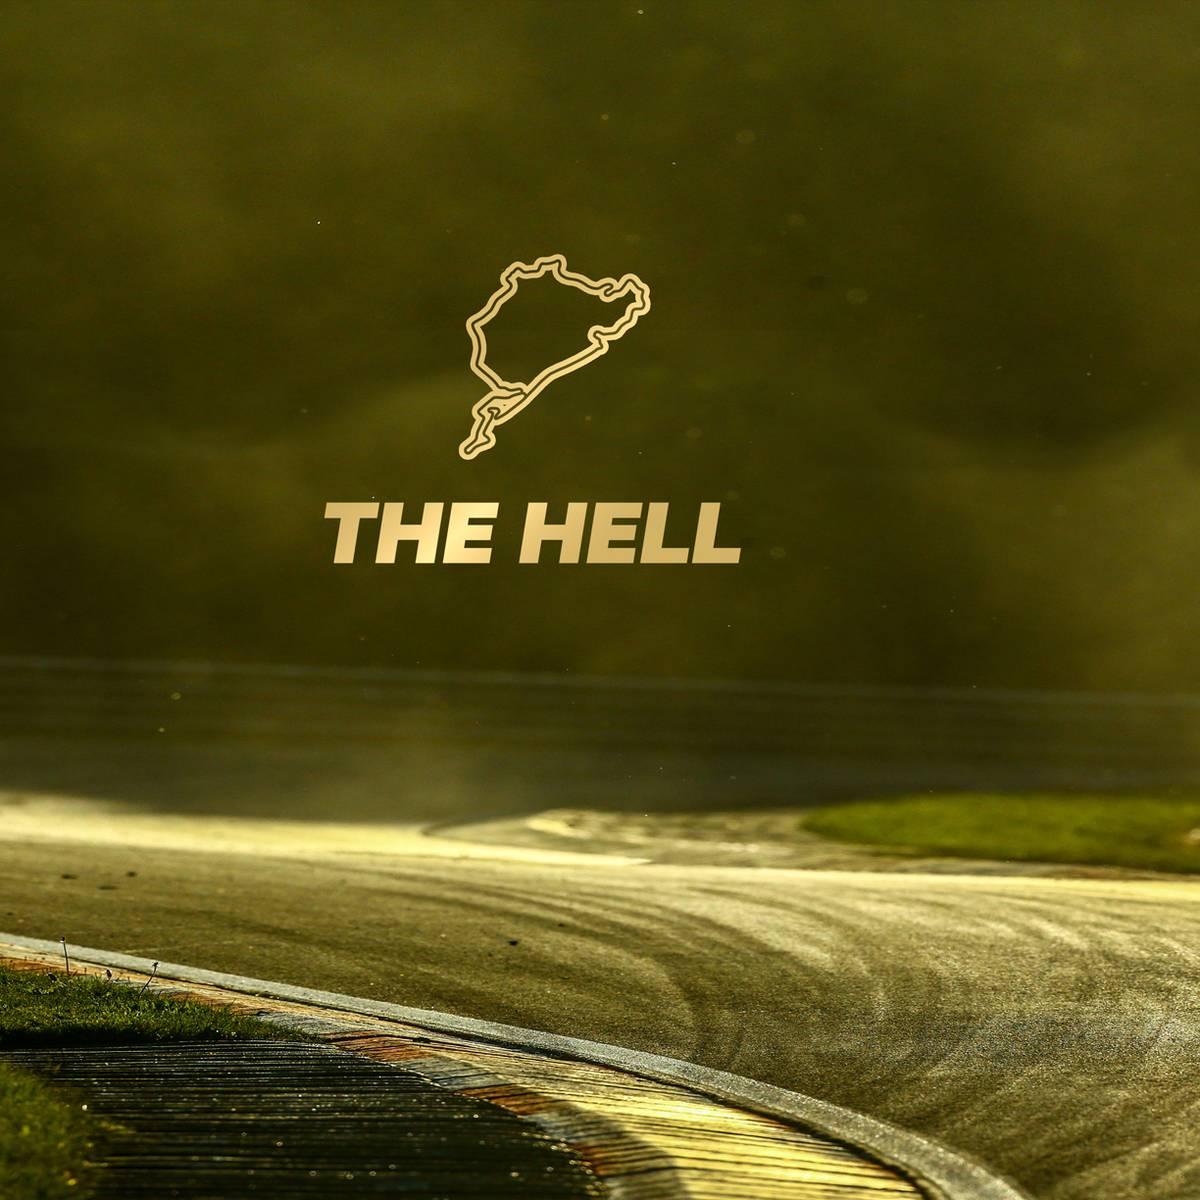 THE HELL: SPORT1 zeigt Doku